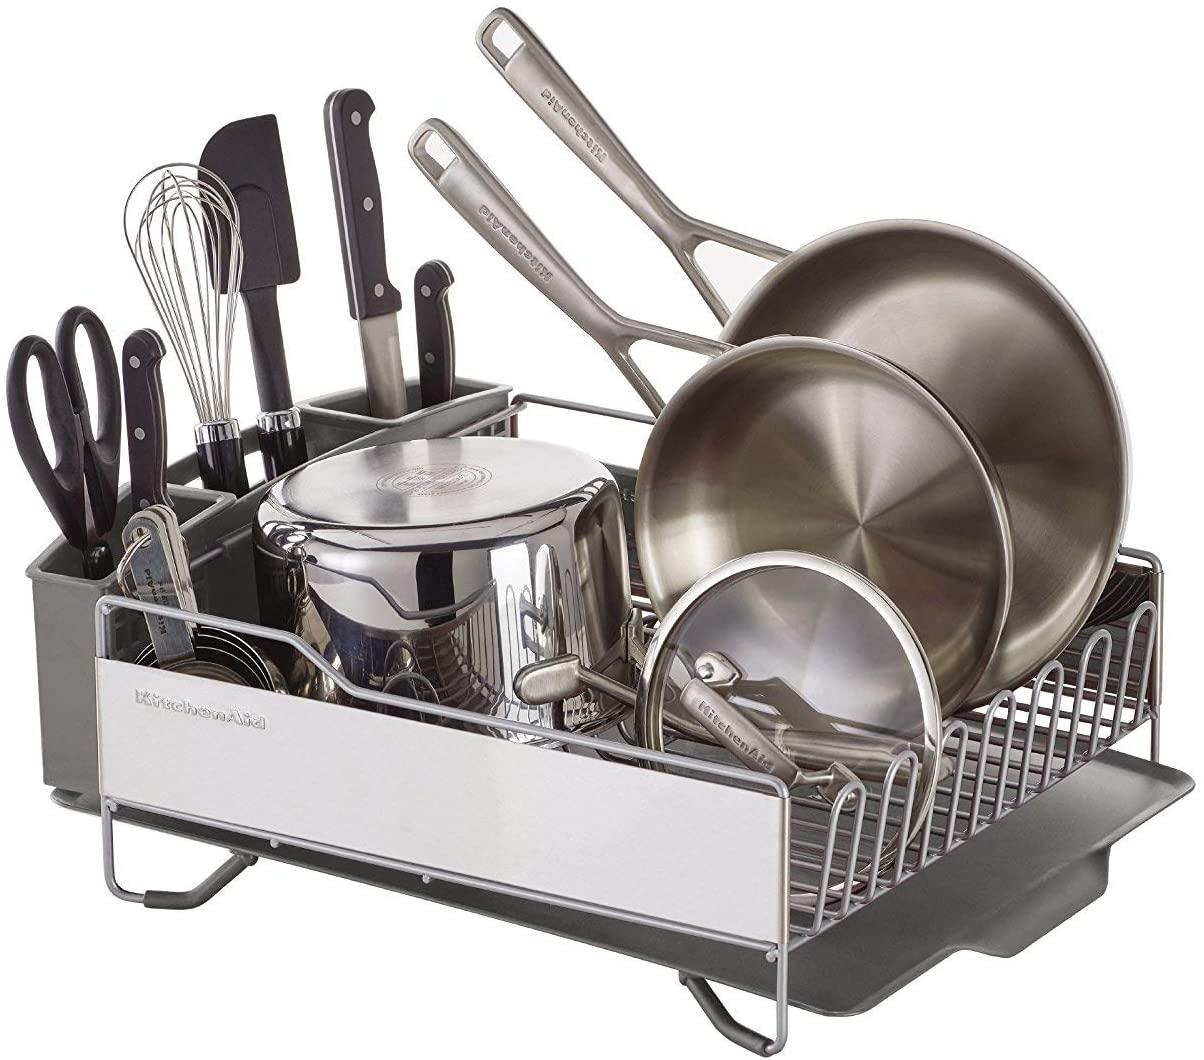 Review of KitchenAid Full Size Dish Rack, Light Grey